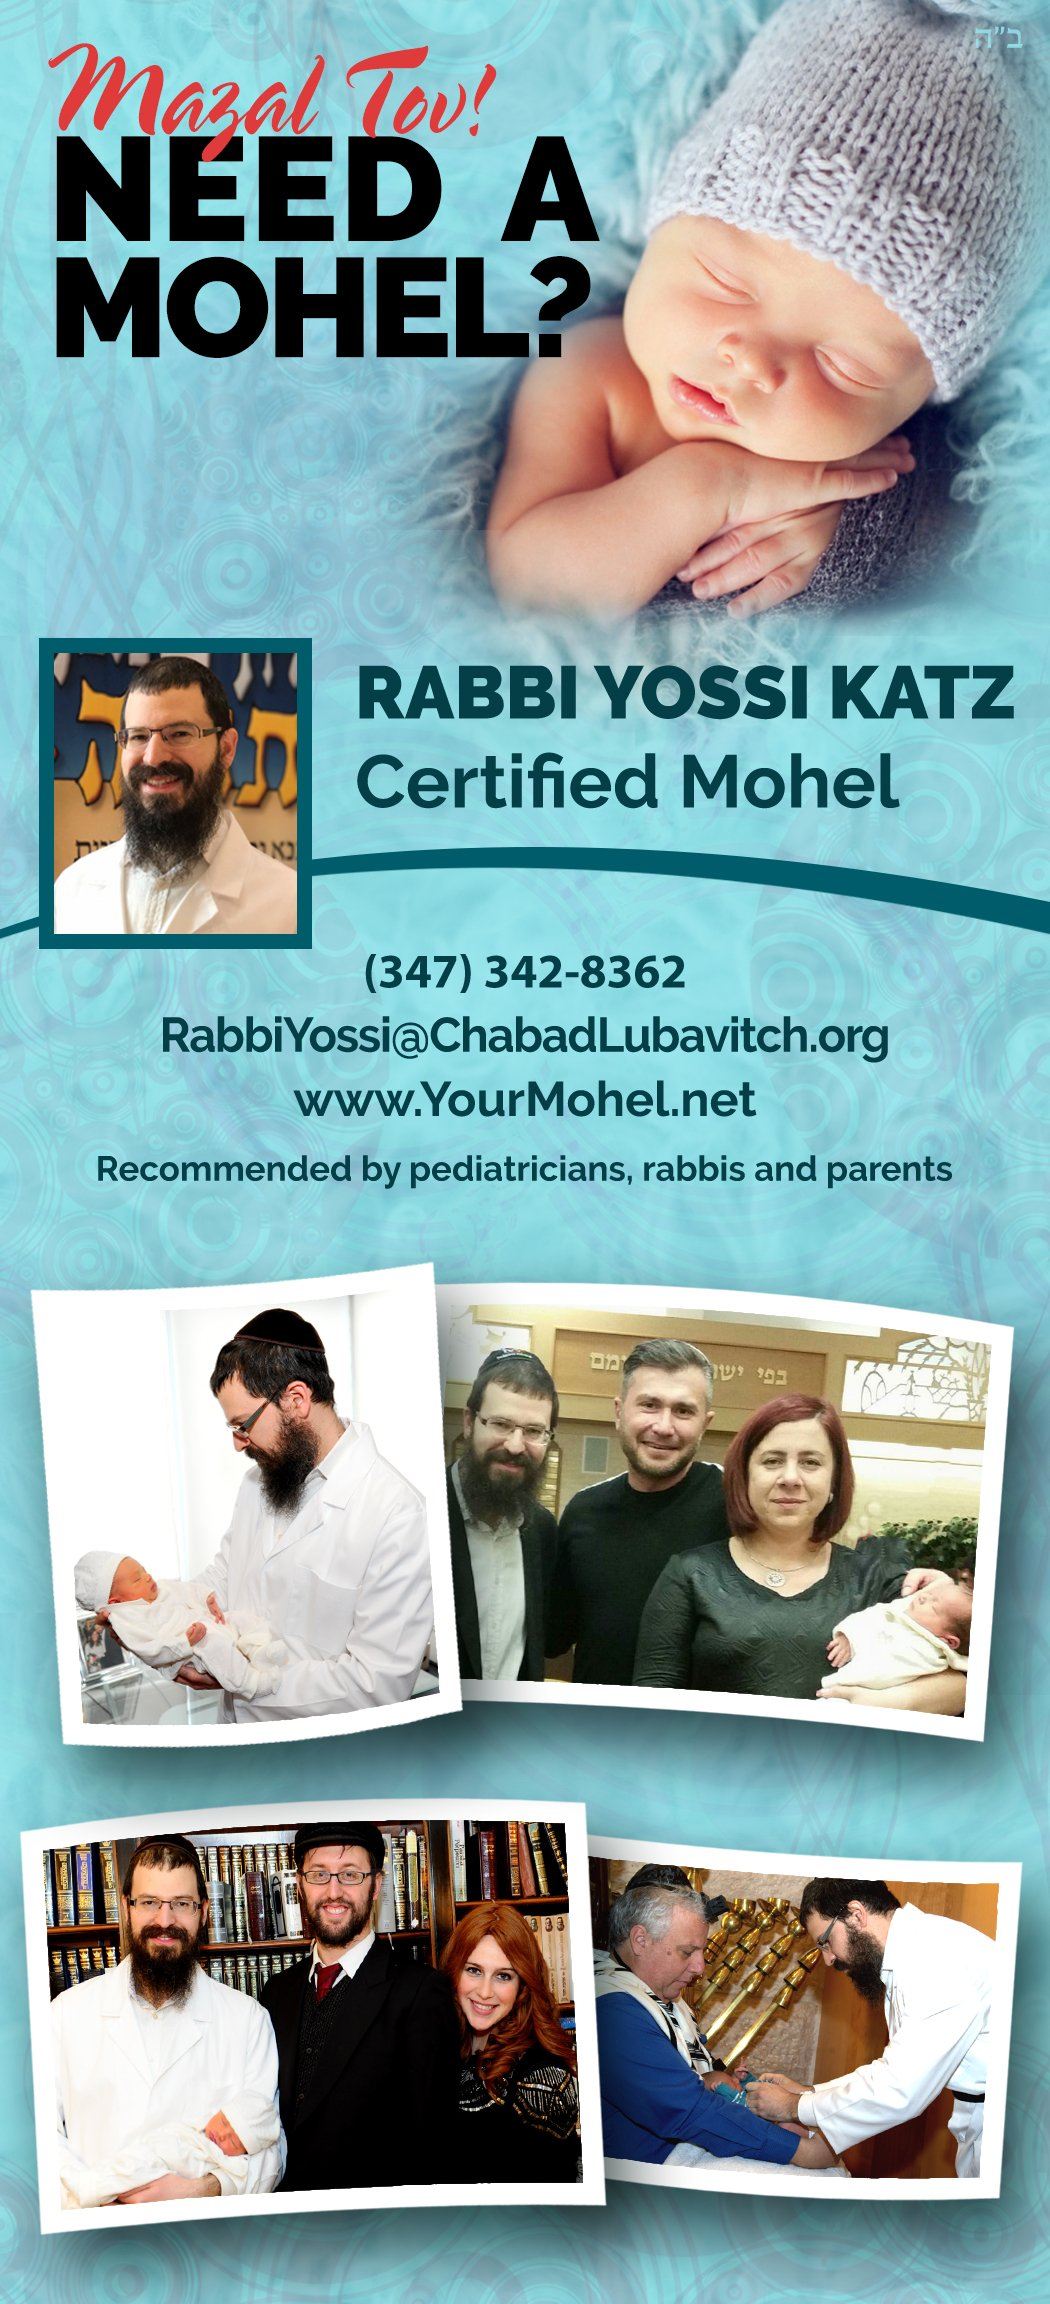 rabbikatz.jpg